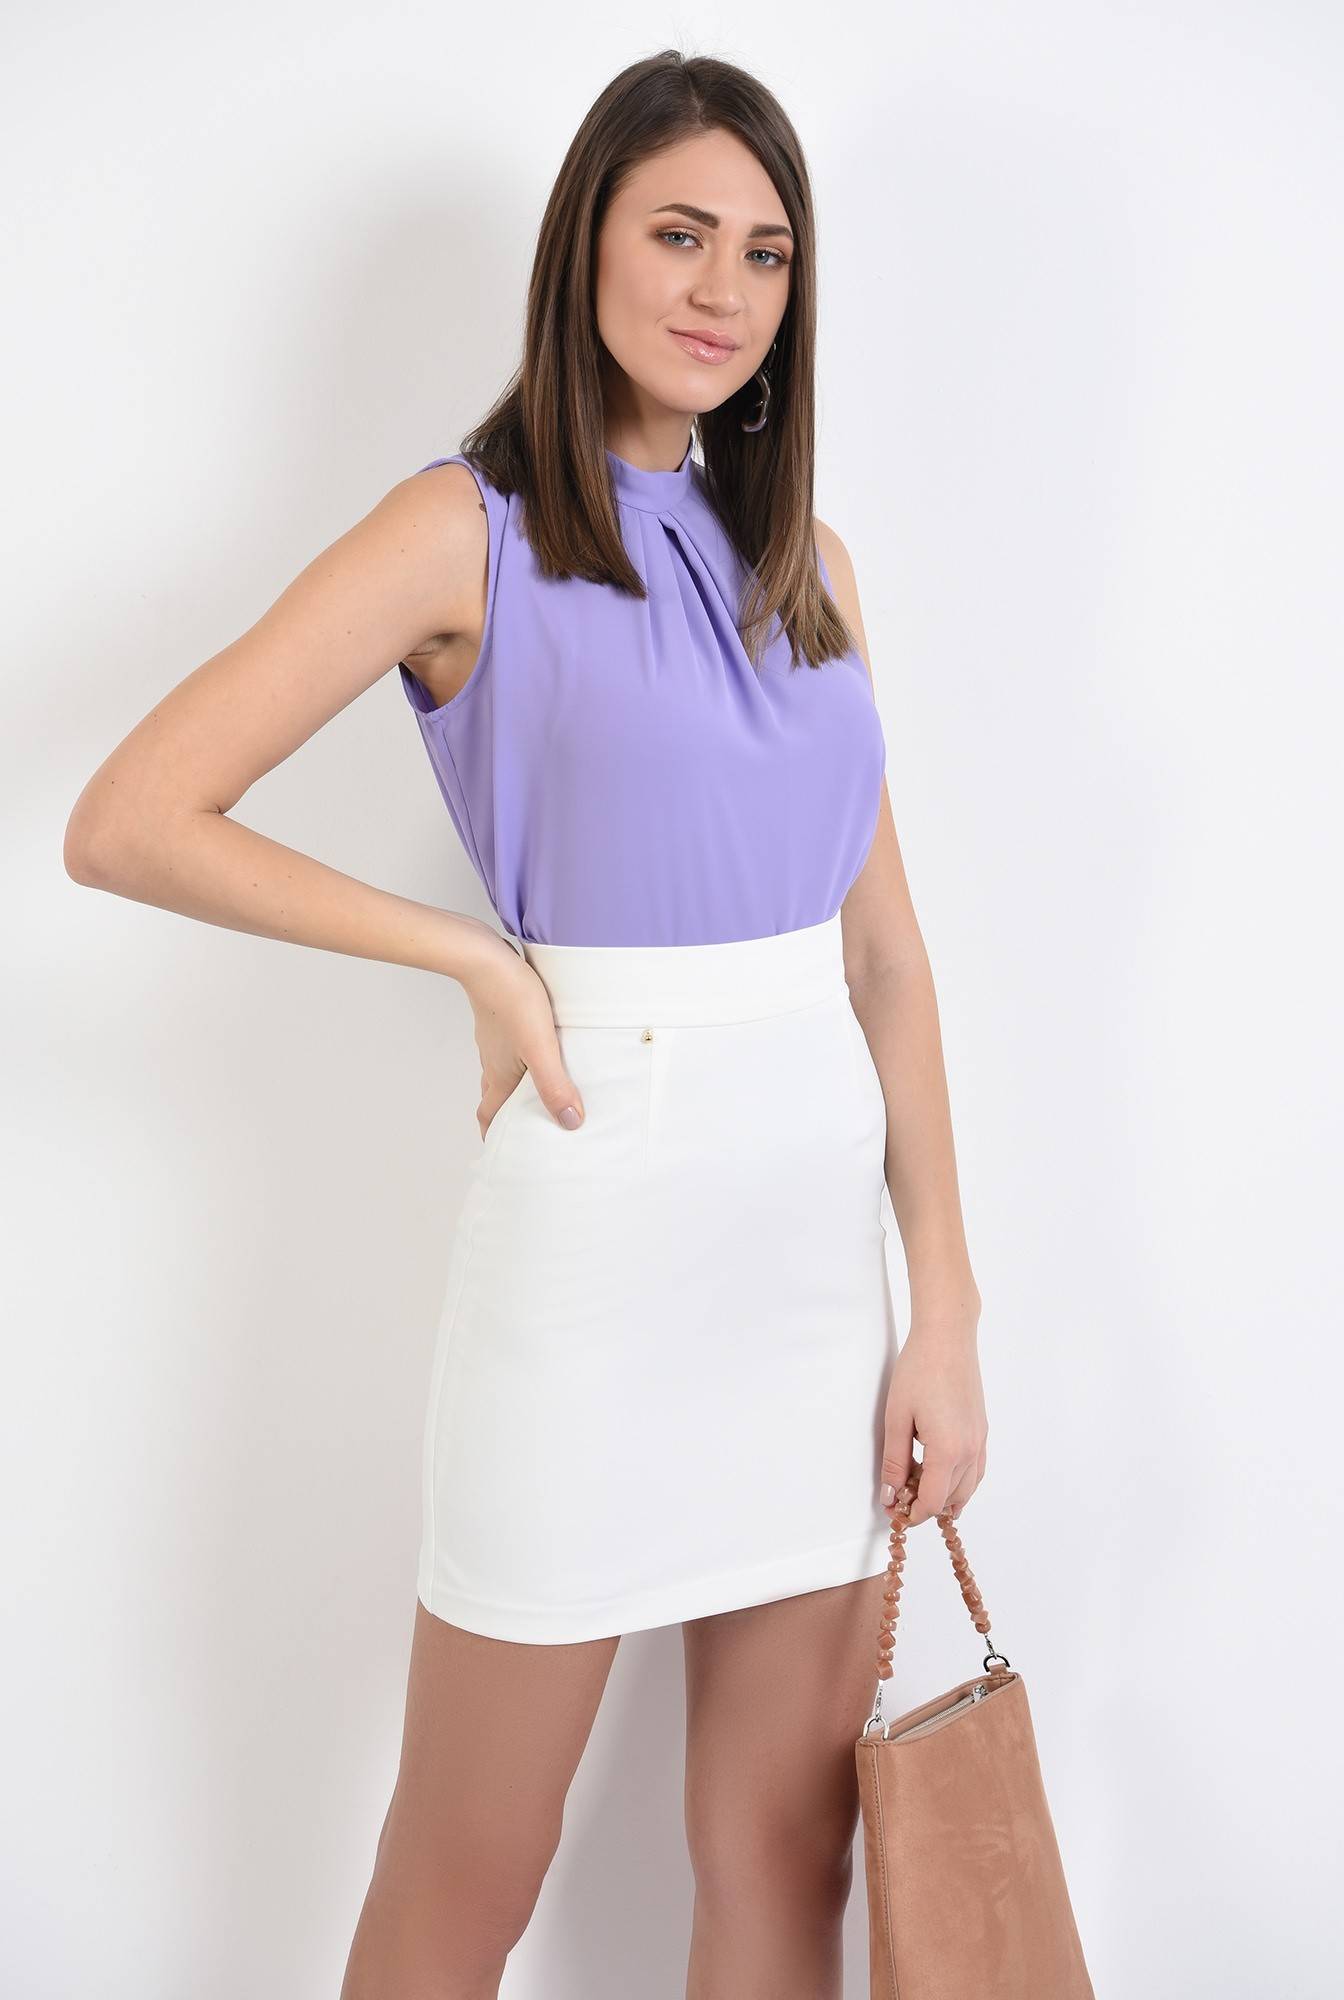 0 - bluza office, pliuri, guler mic, lila, bluza de primavara